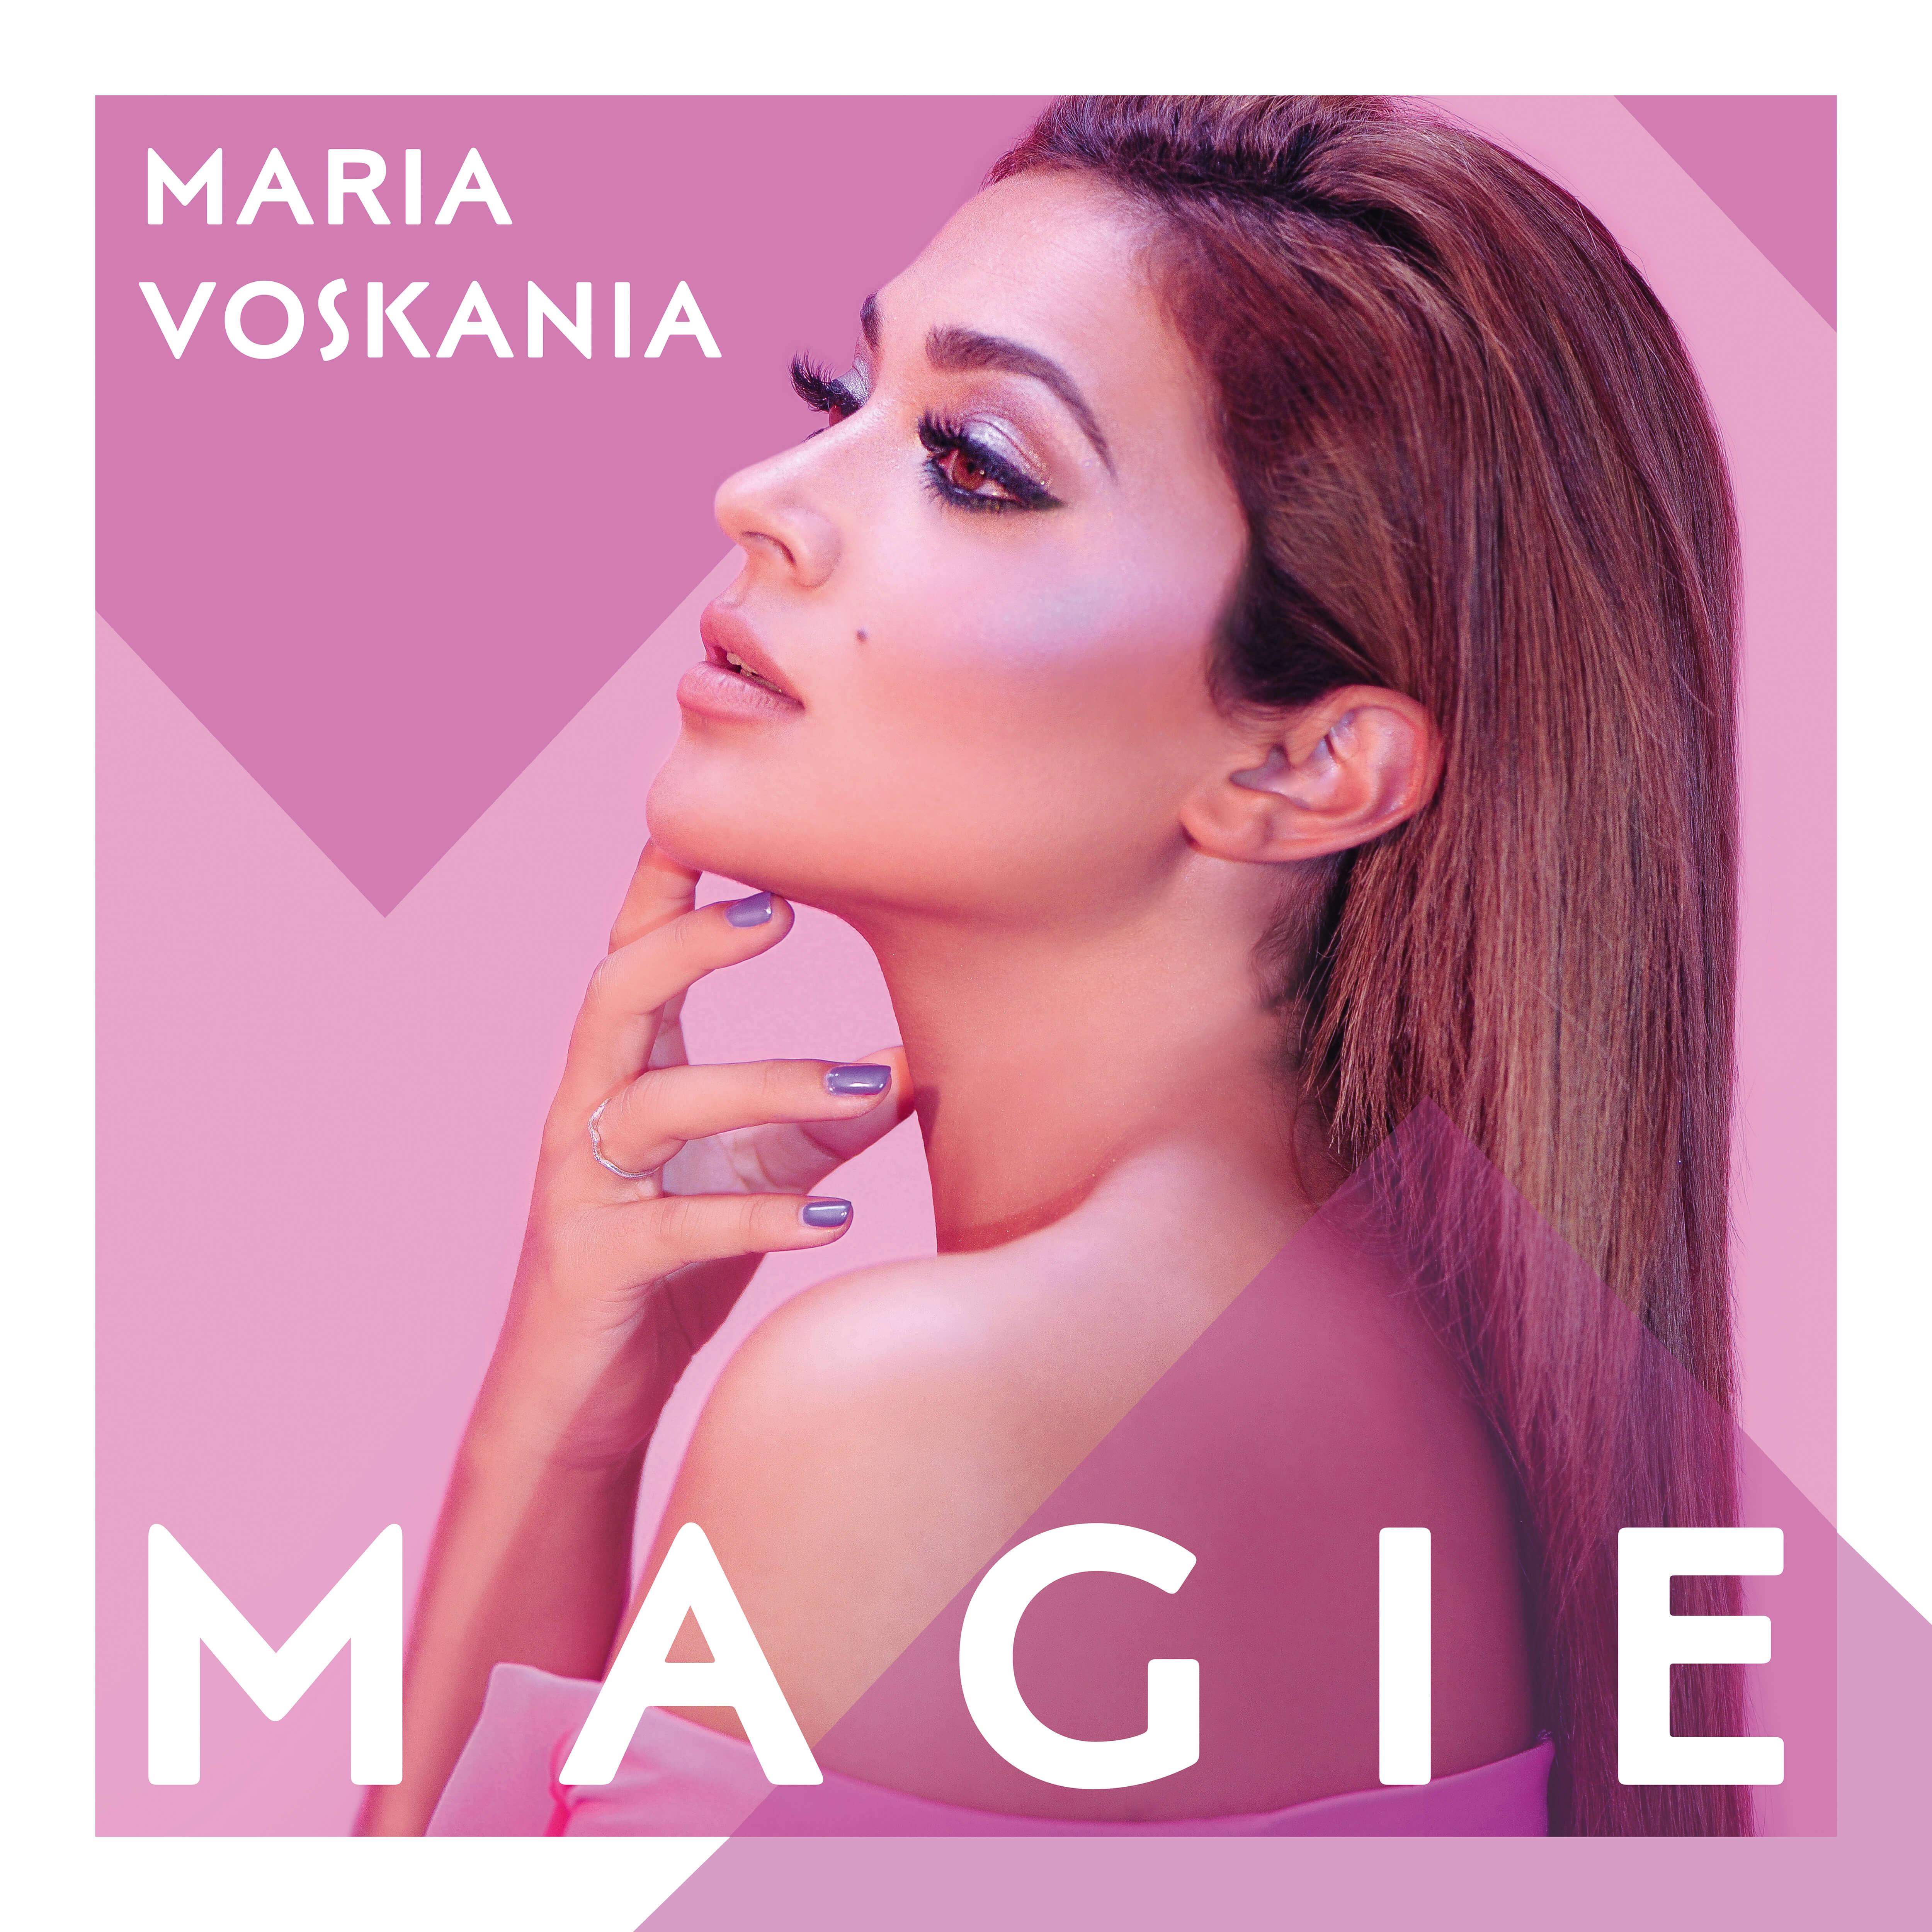 Maria Voskania • MAGIE